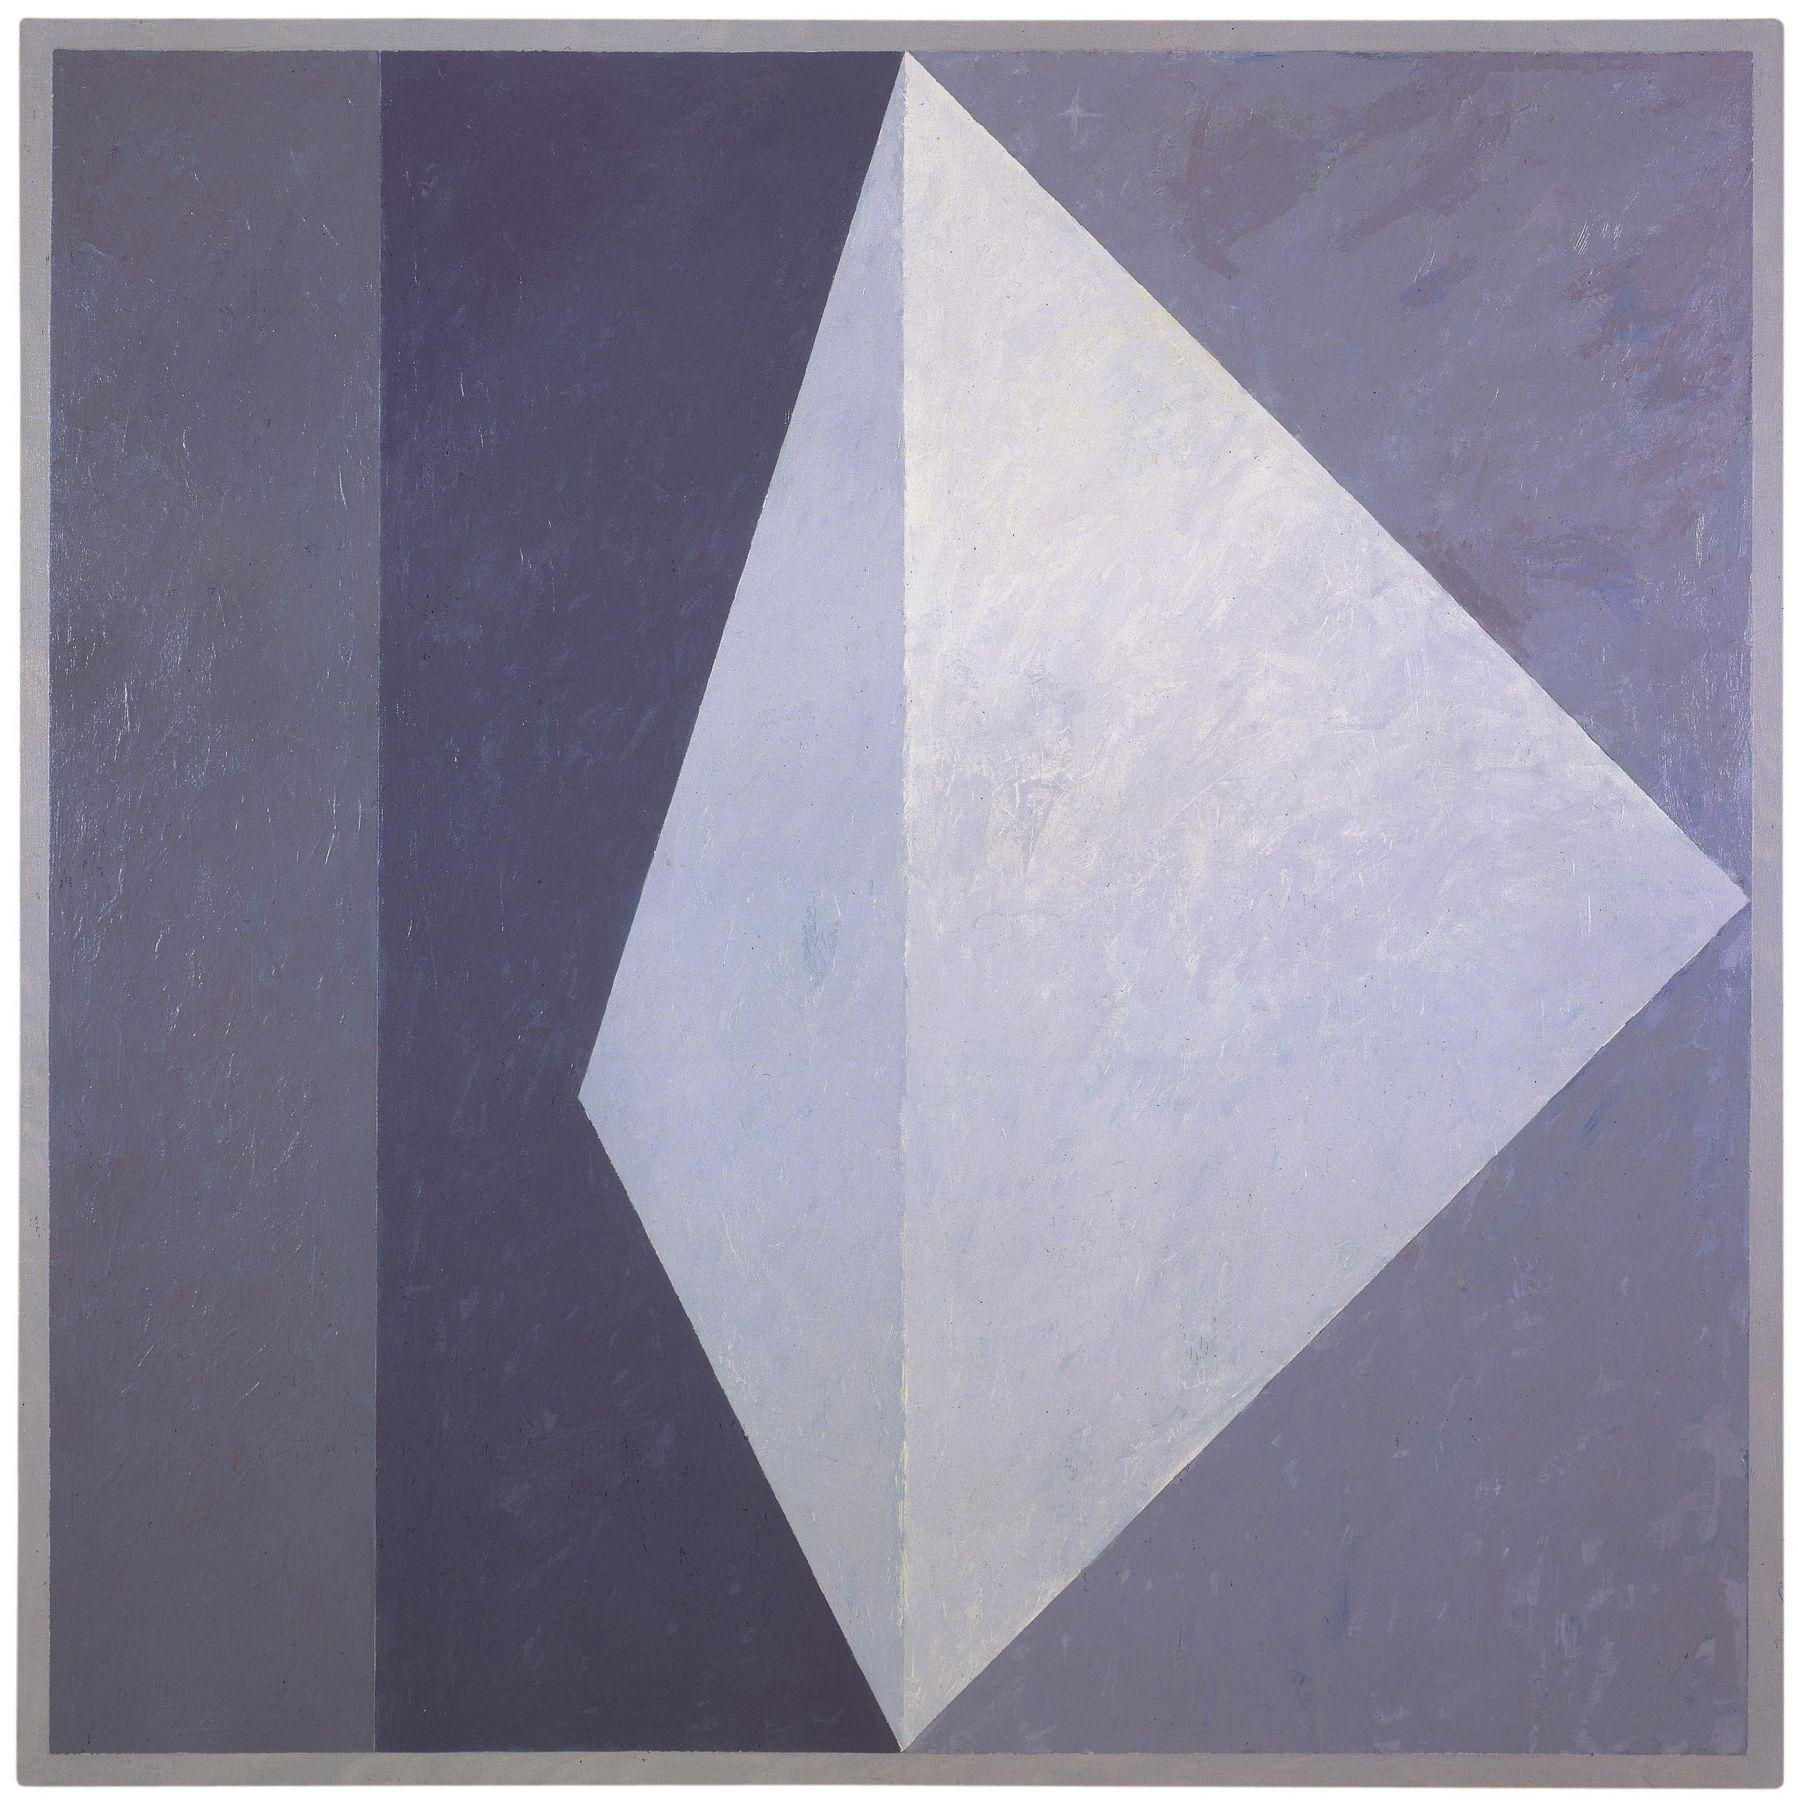 Alternative VIII (Q1-78 #4), 1978, Oil on canvas